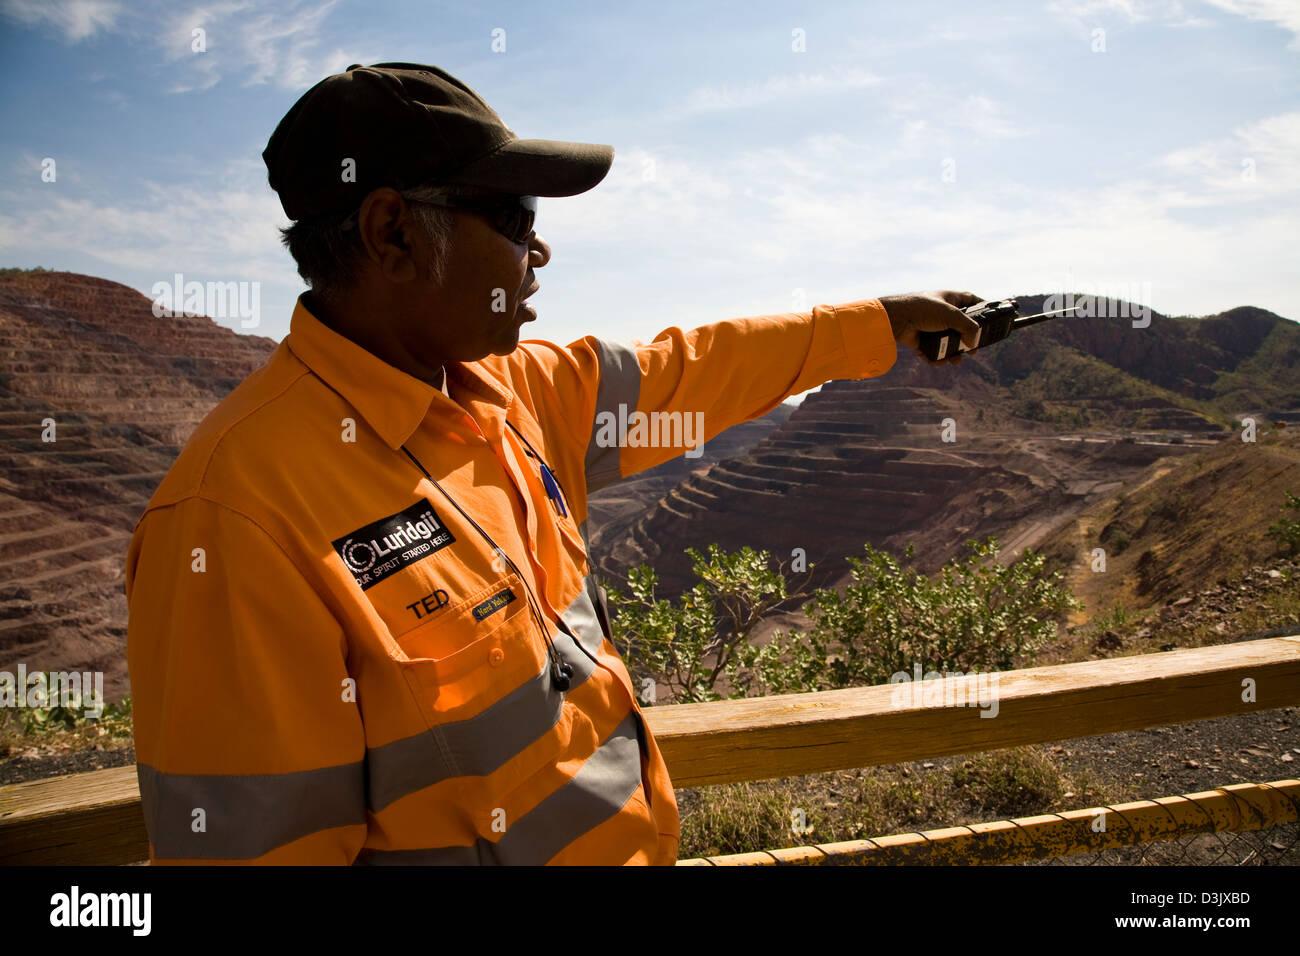 Ted Hall, conducts a tour at Argyle Diamond Mine, south of Kununnura, East Kimberly region, Western Australia - Stock Image